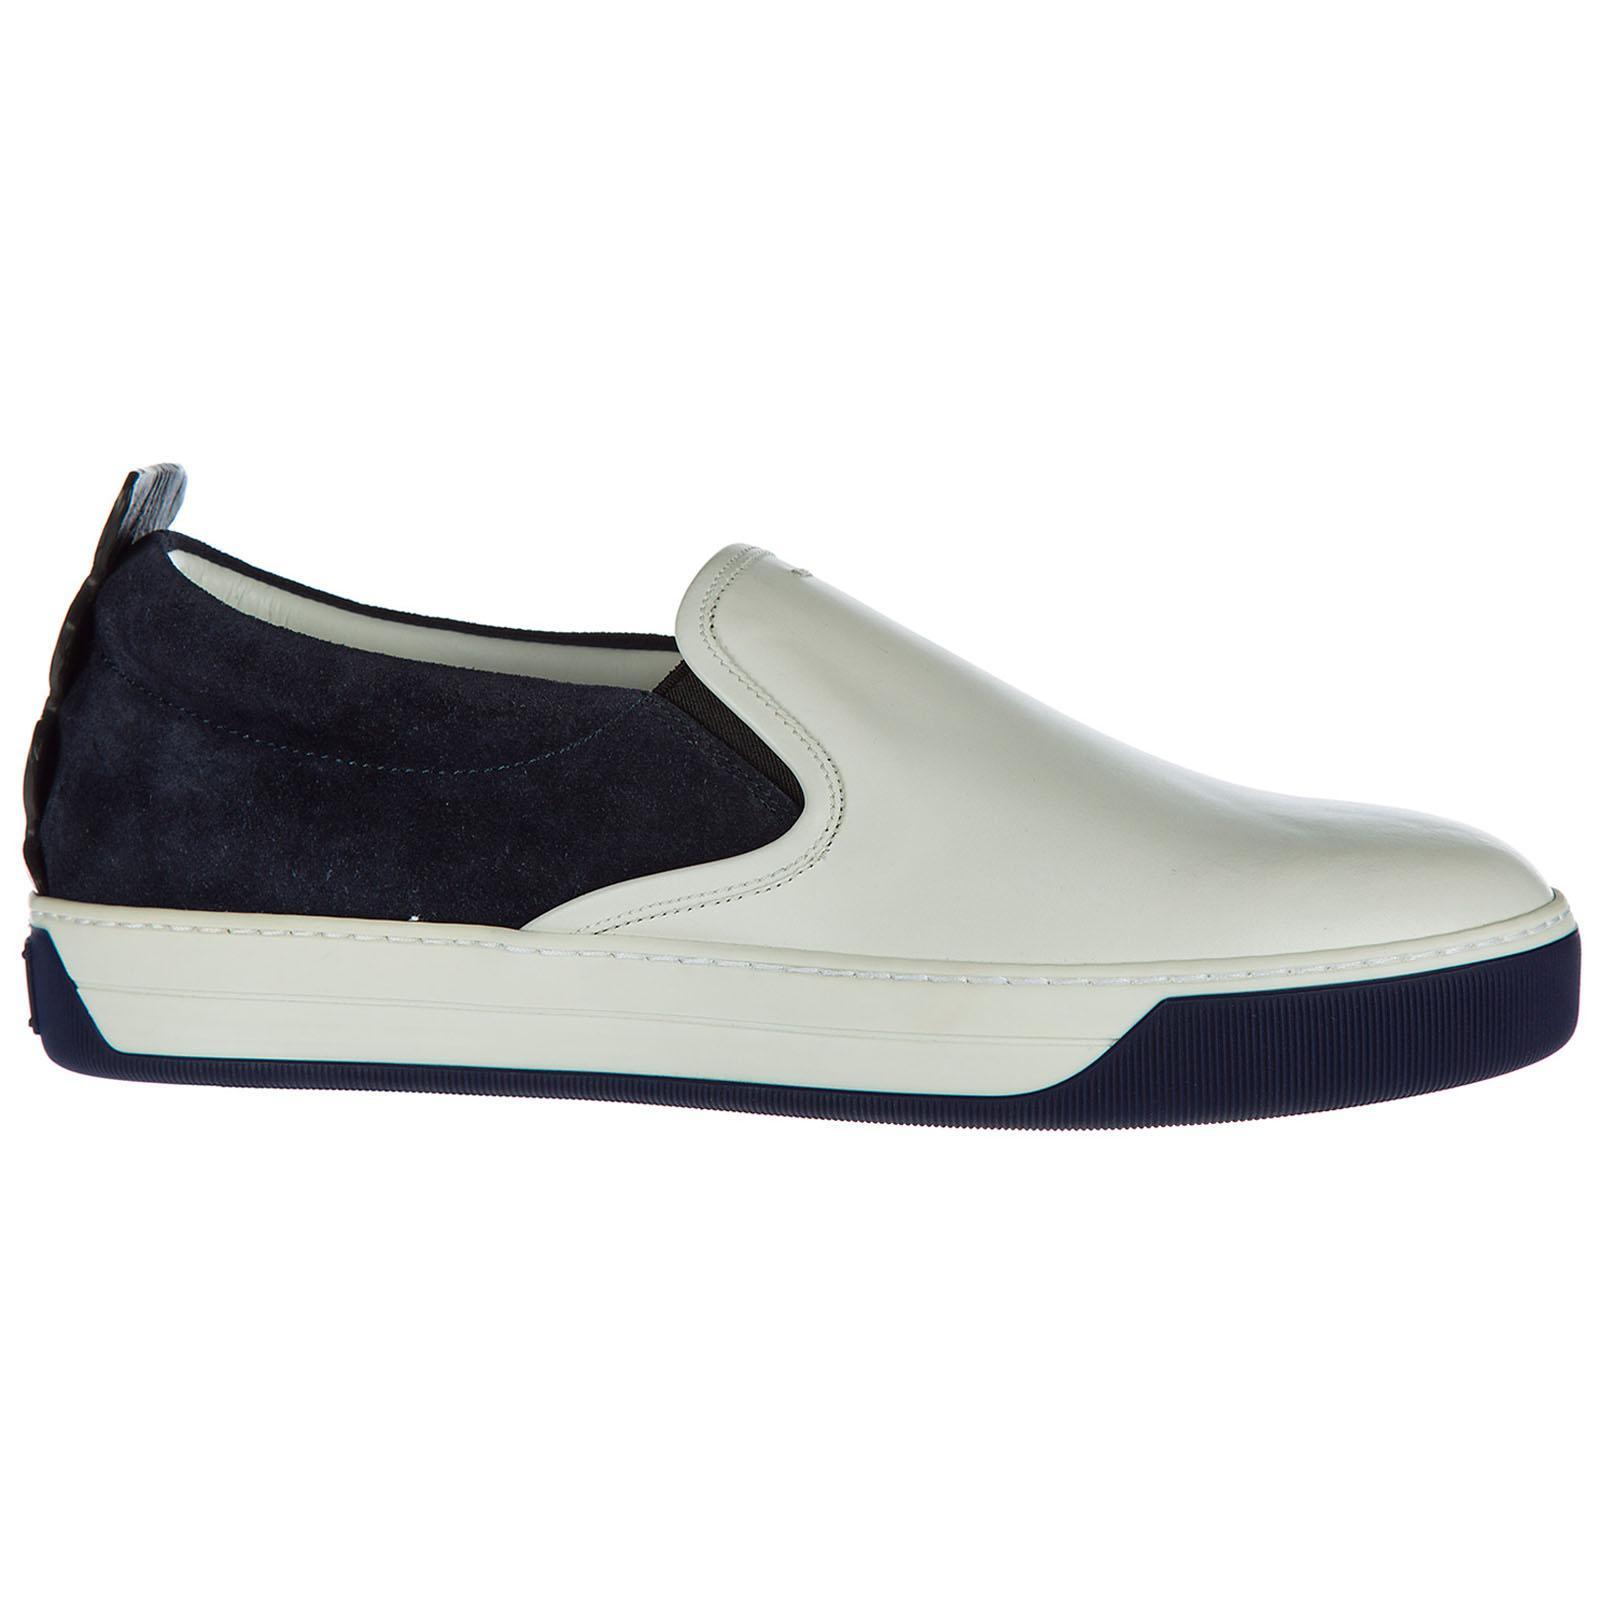 Fendi Suede Slip On Sneakers for Men